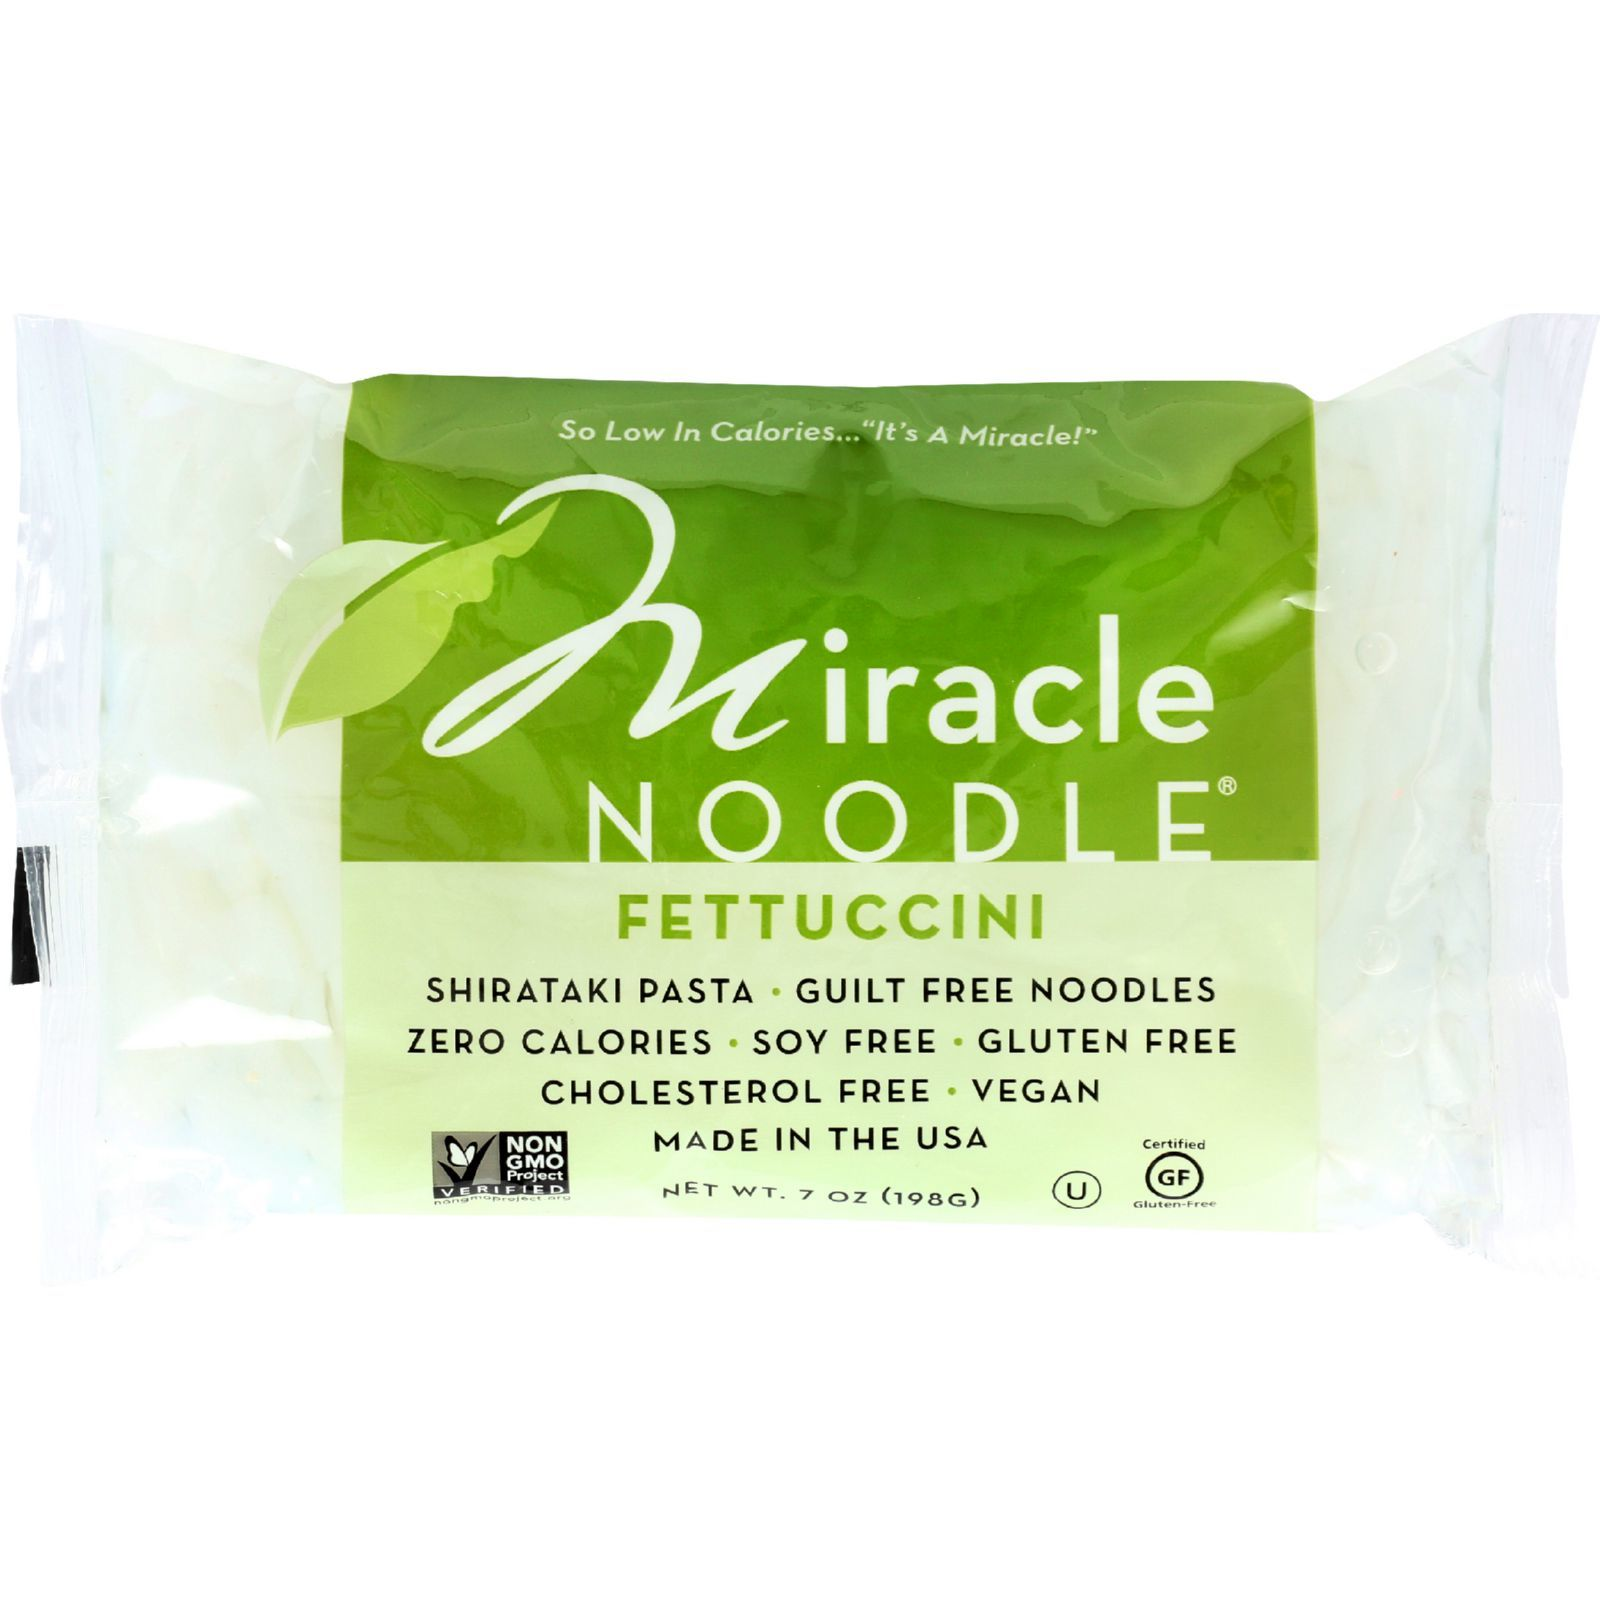 Miracle Noodle Pasta - Shirataki - Miracle Noodle - Fettuccini - 7 oz - case of 6